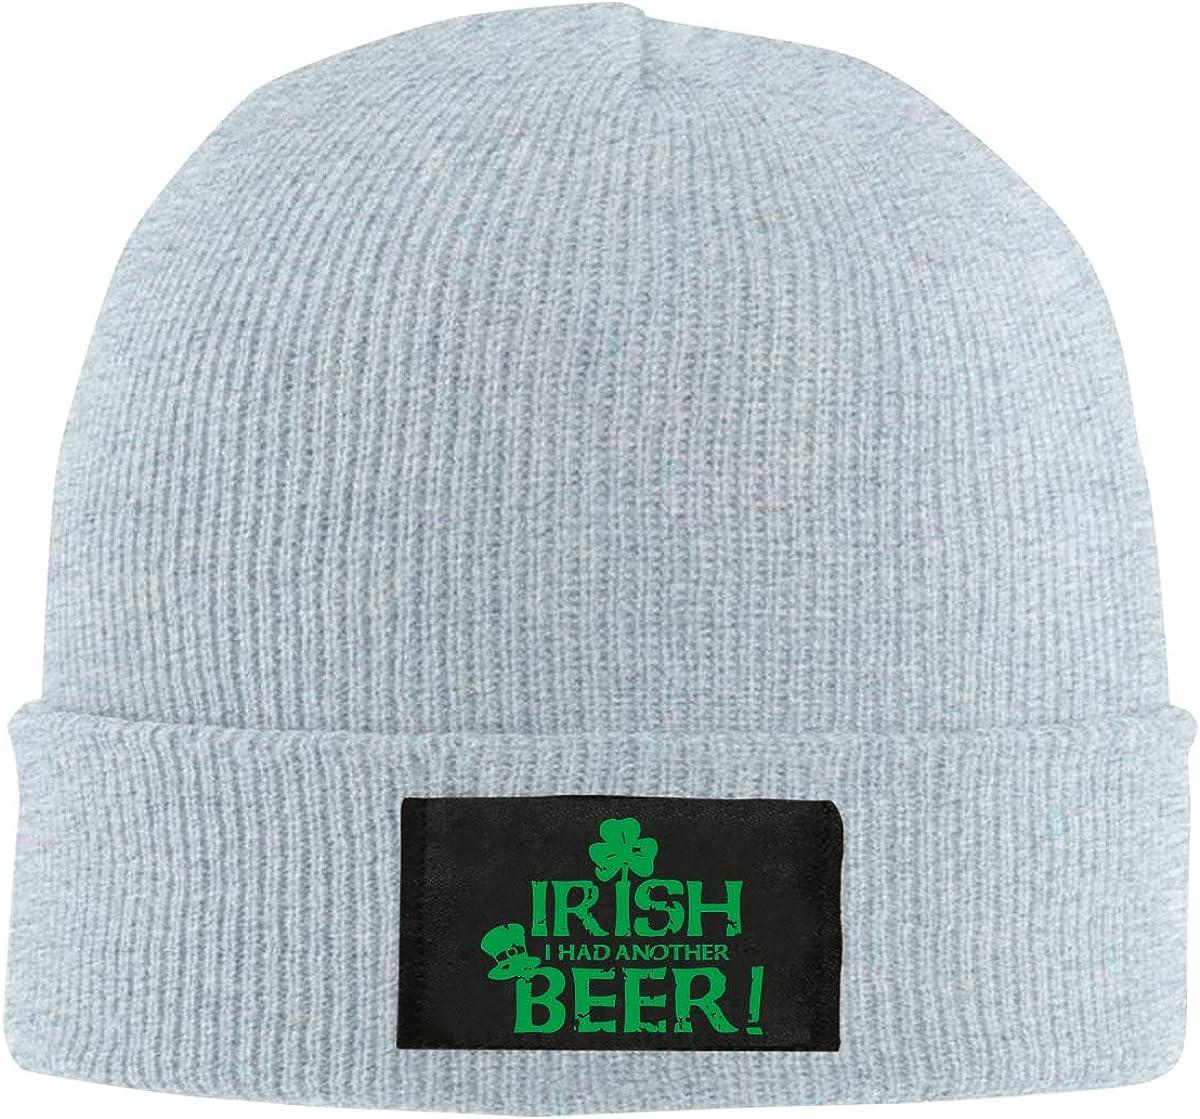 100/% Acrylic Daily Skull Cap BF5Y6z/&MA Unisex St Patricks Day Irish Knitting Hat